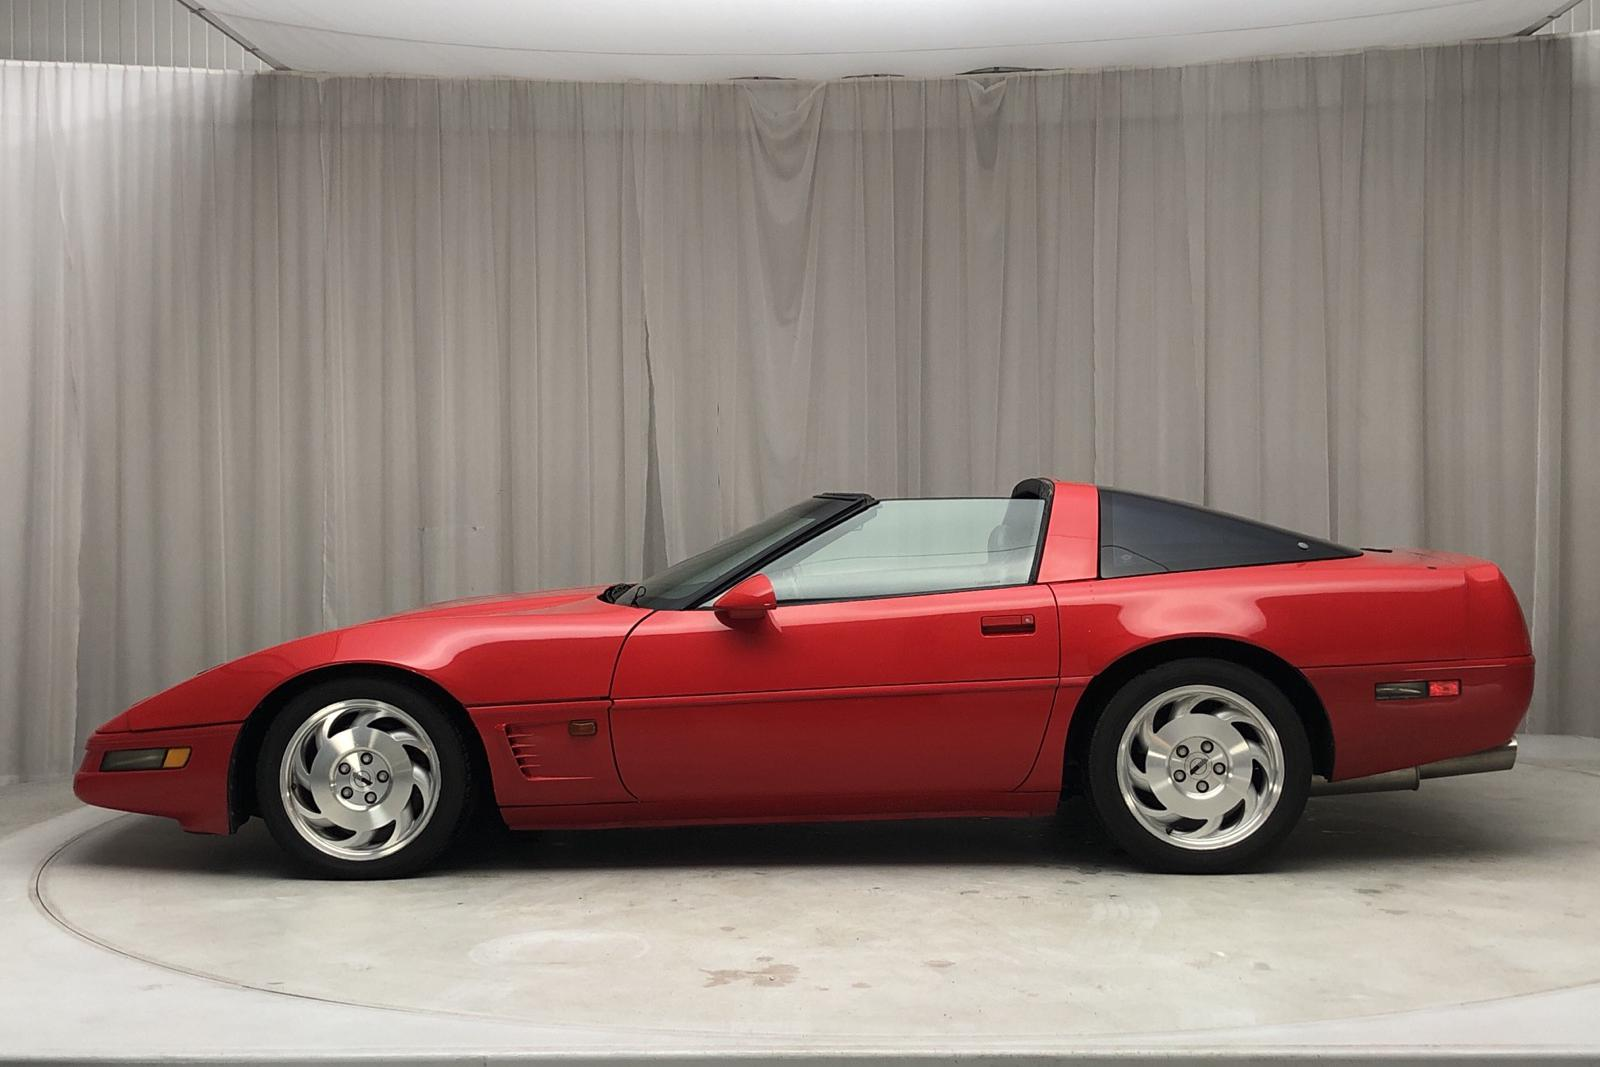 Chevrolet Corvette 5.7 V8 Targa (305hk) - 121 140 km - Automatic - red - 1995